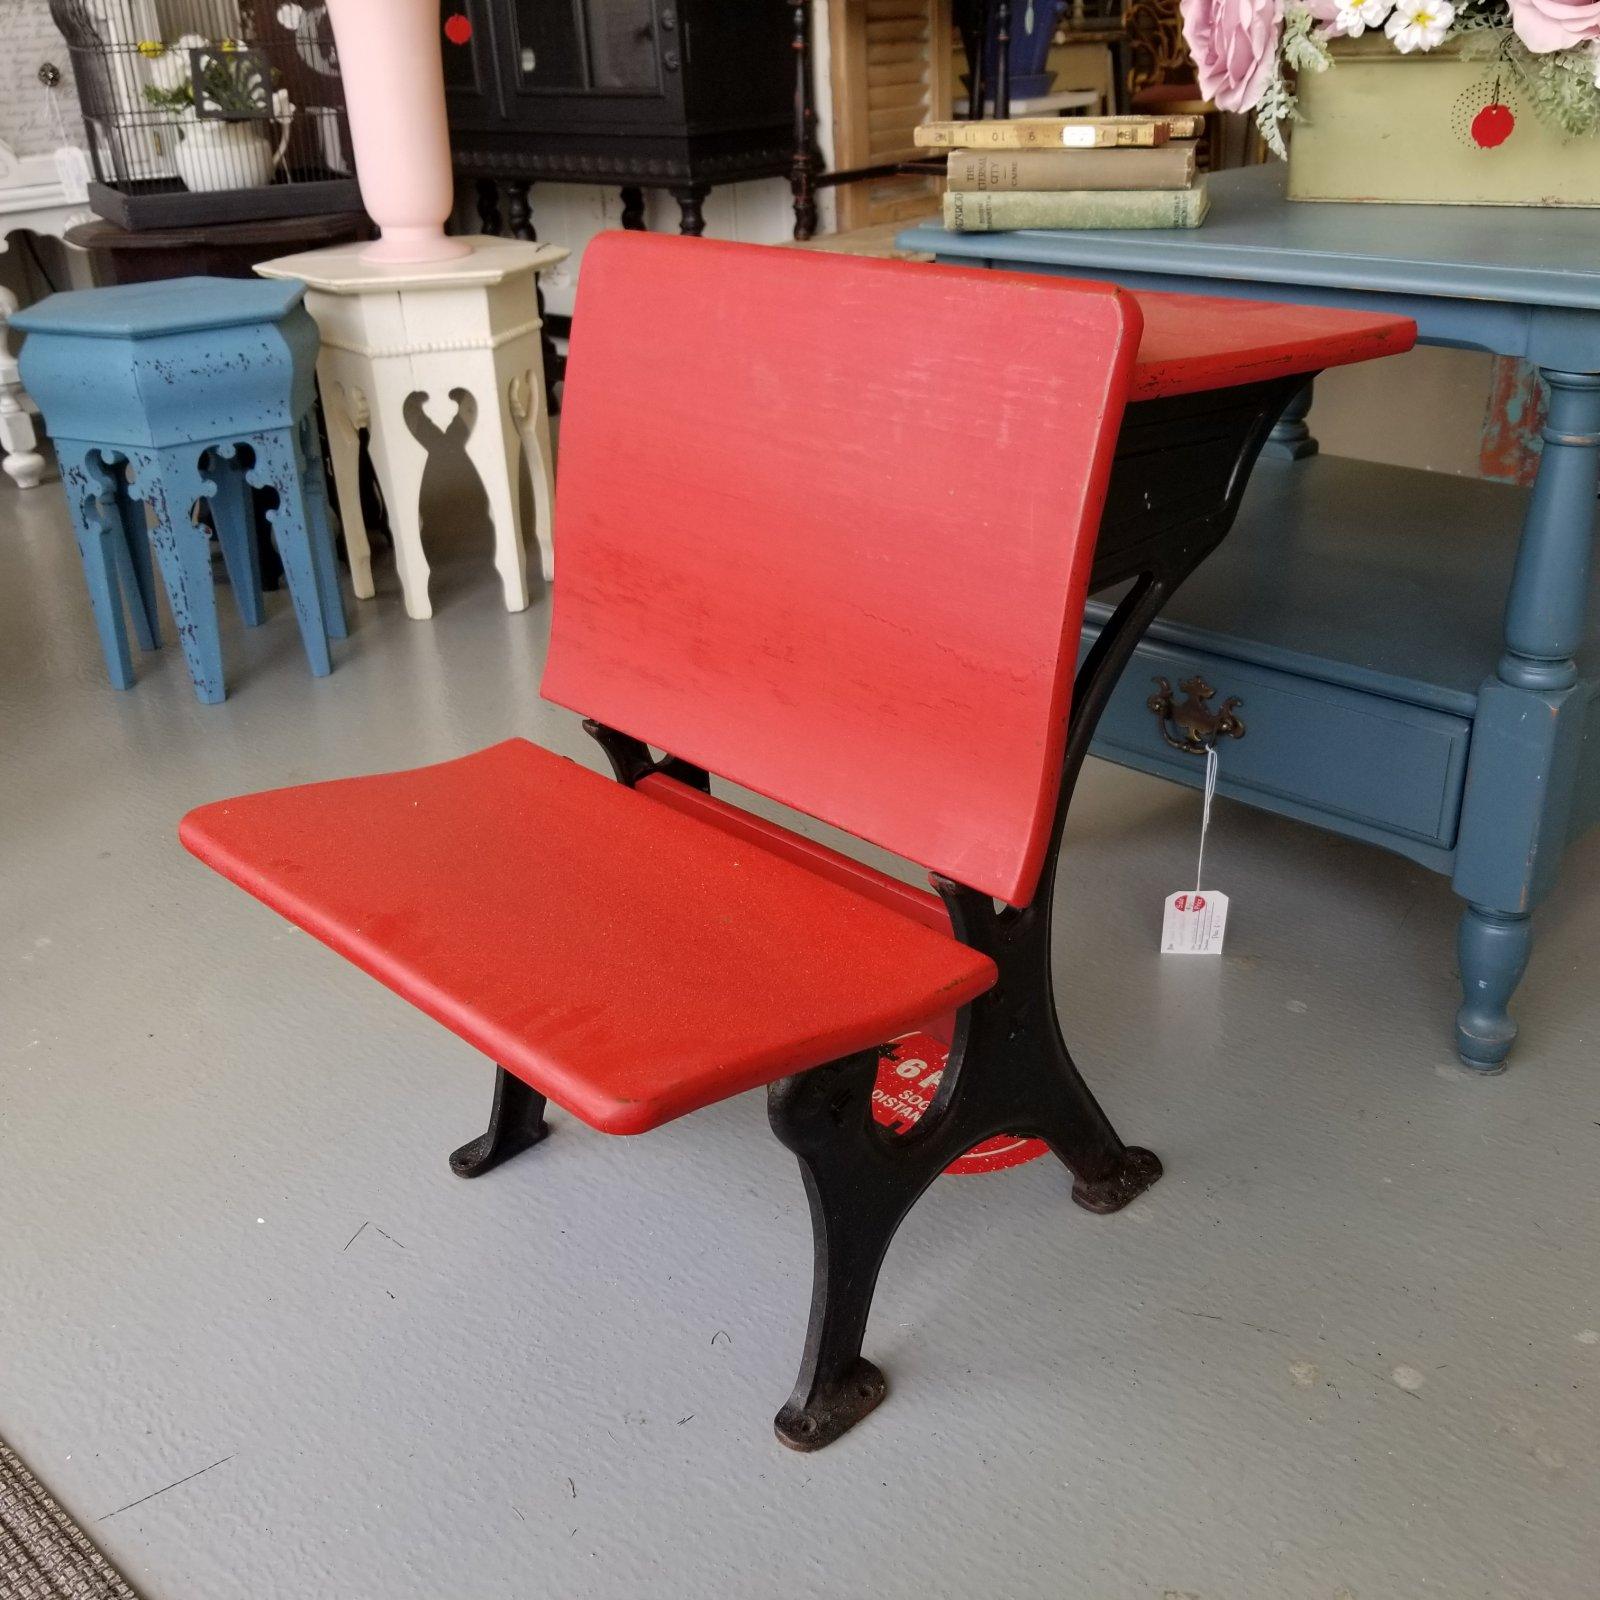 Red Childs School Desk